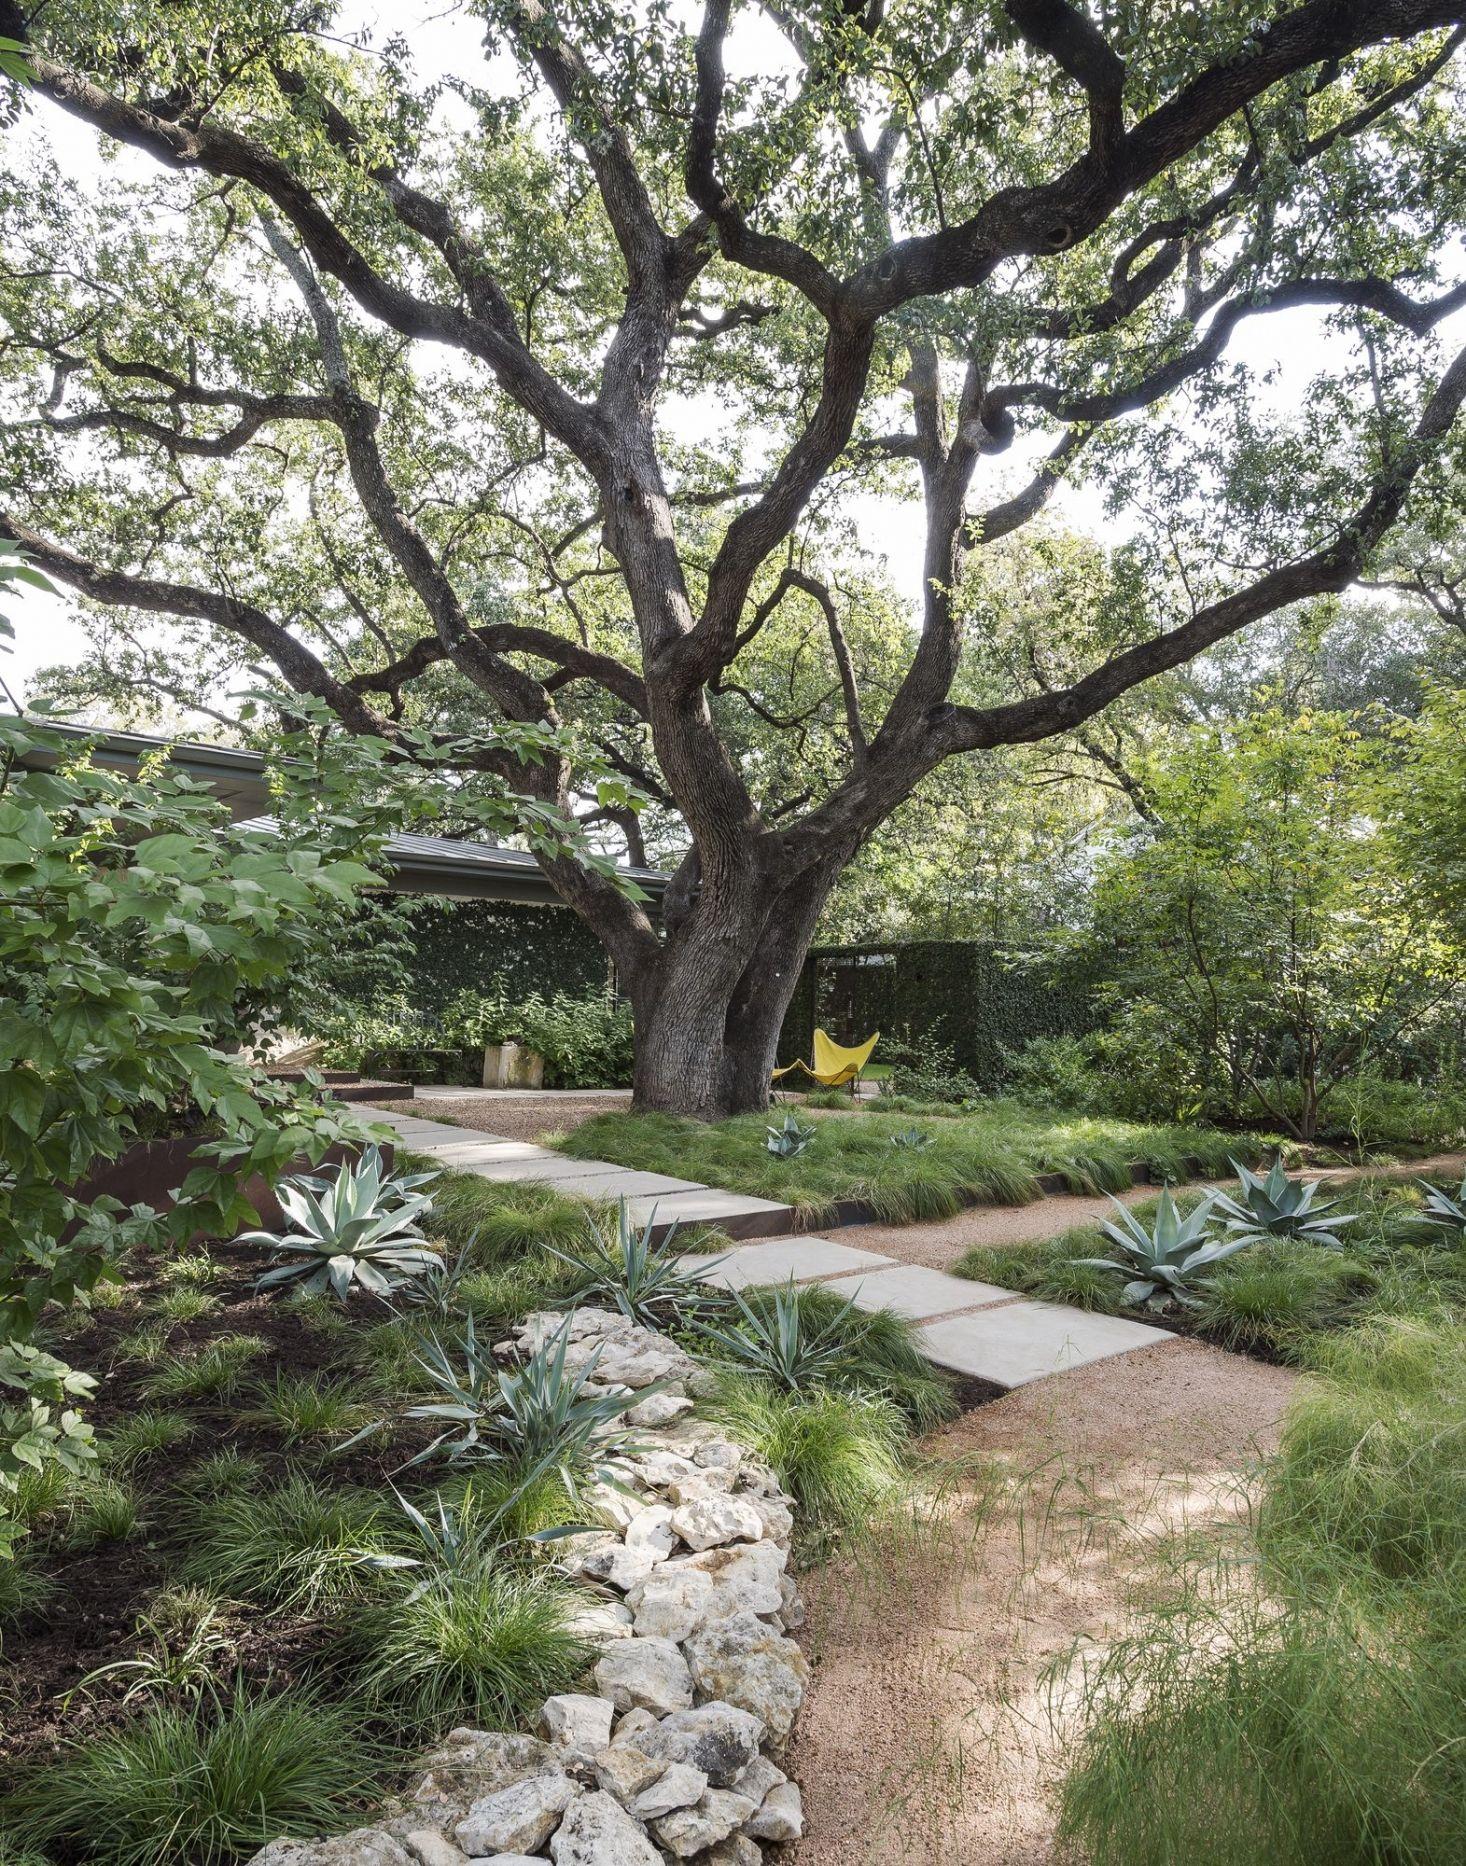 35 Smart And Stylish Garden Screening Ideas To To Transform Your Garden Small Backyard Landscaping Backyard Landscaping Designs Backyard Garden Design